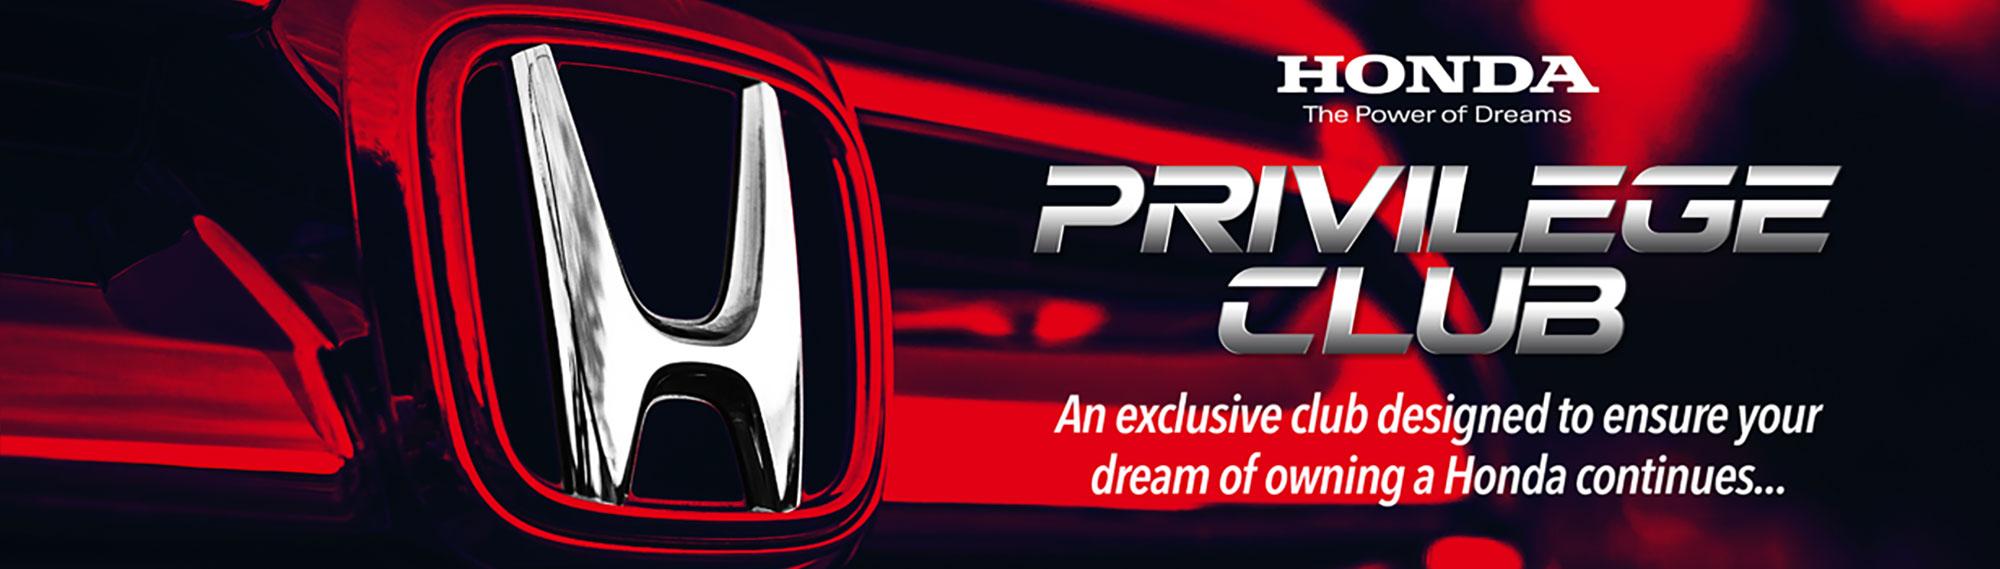 Honda Privilege Club